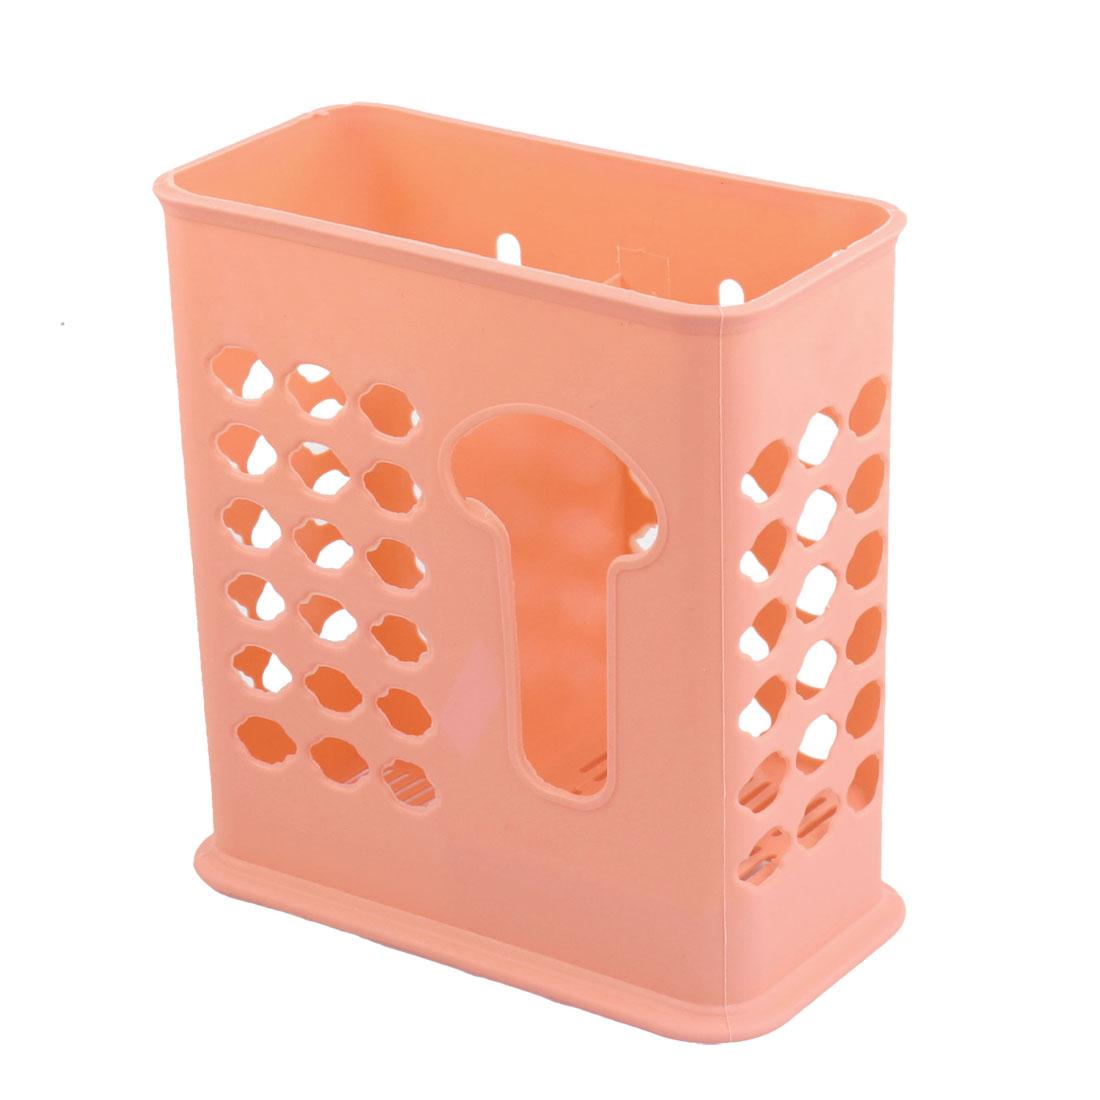 Home Orange Plastic Chopsticks Ladle Organizer Case Holder